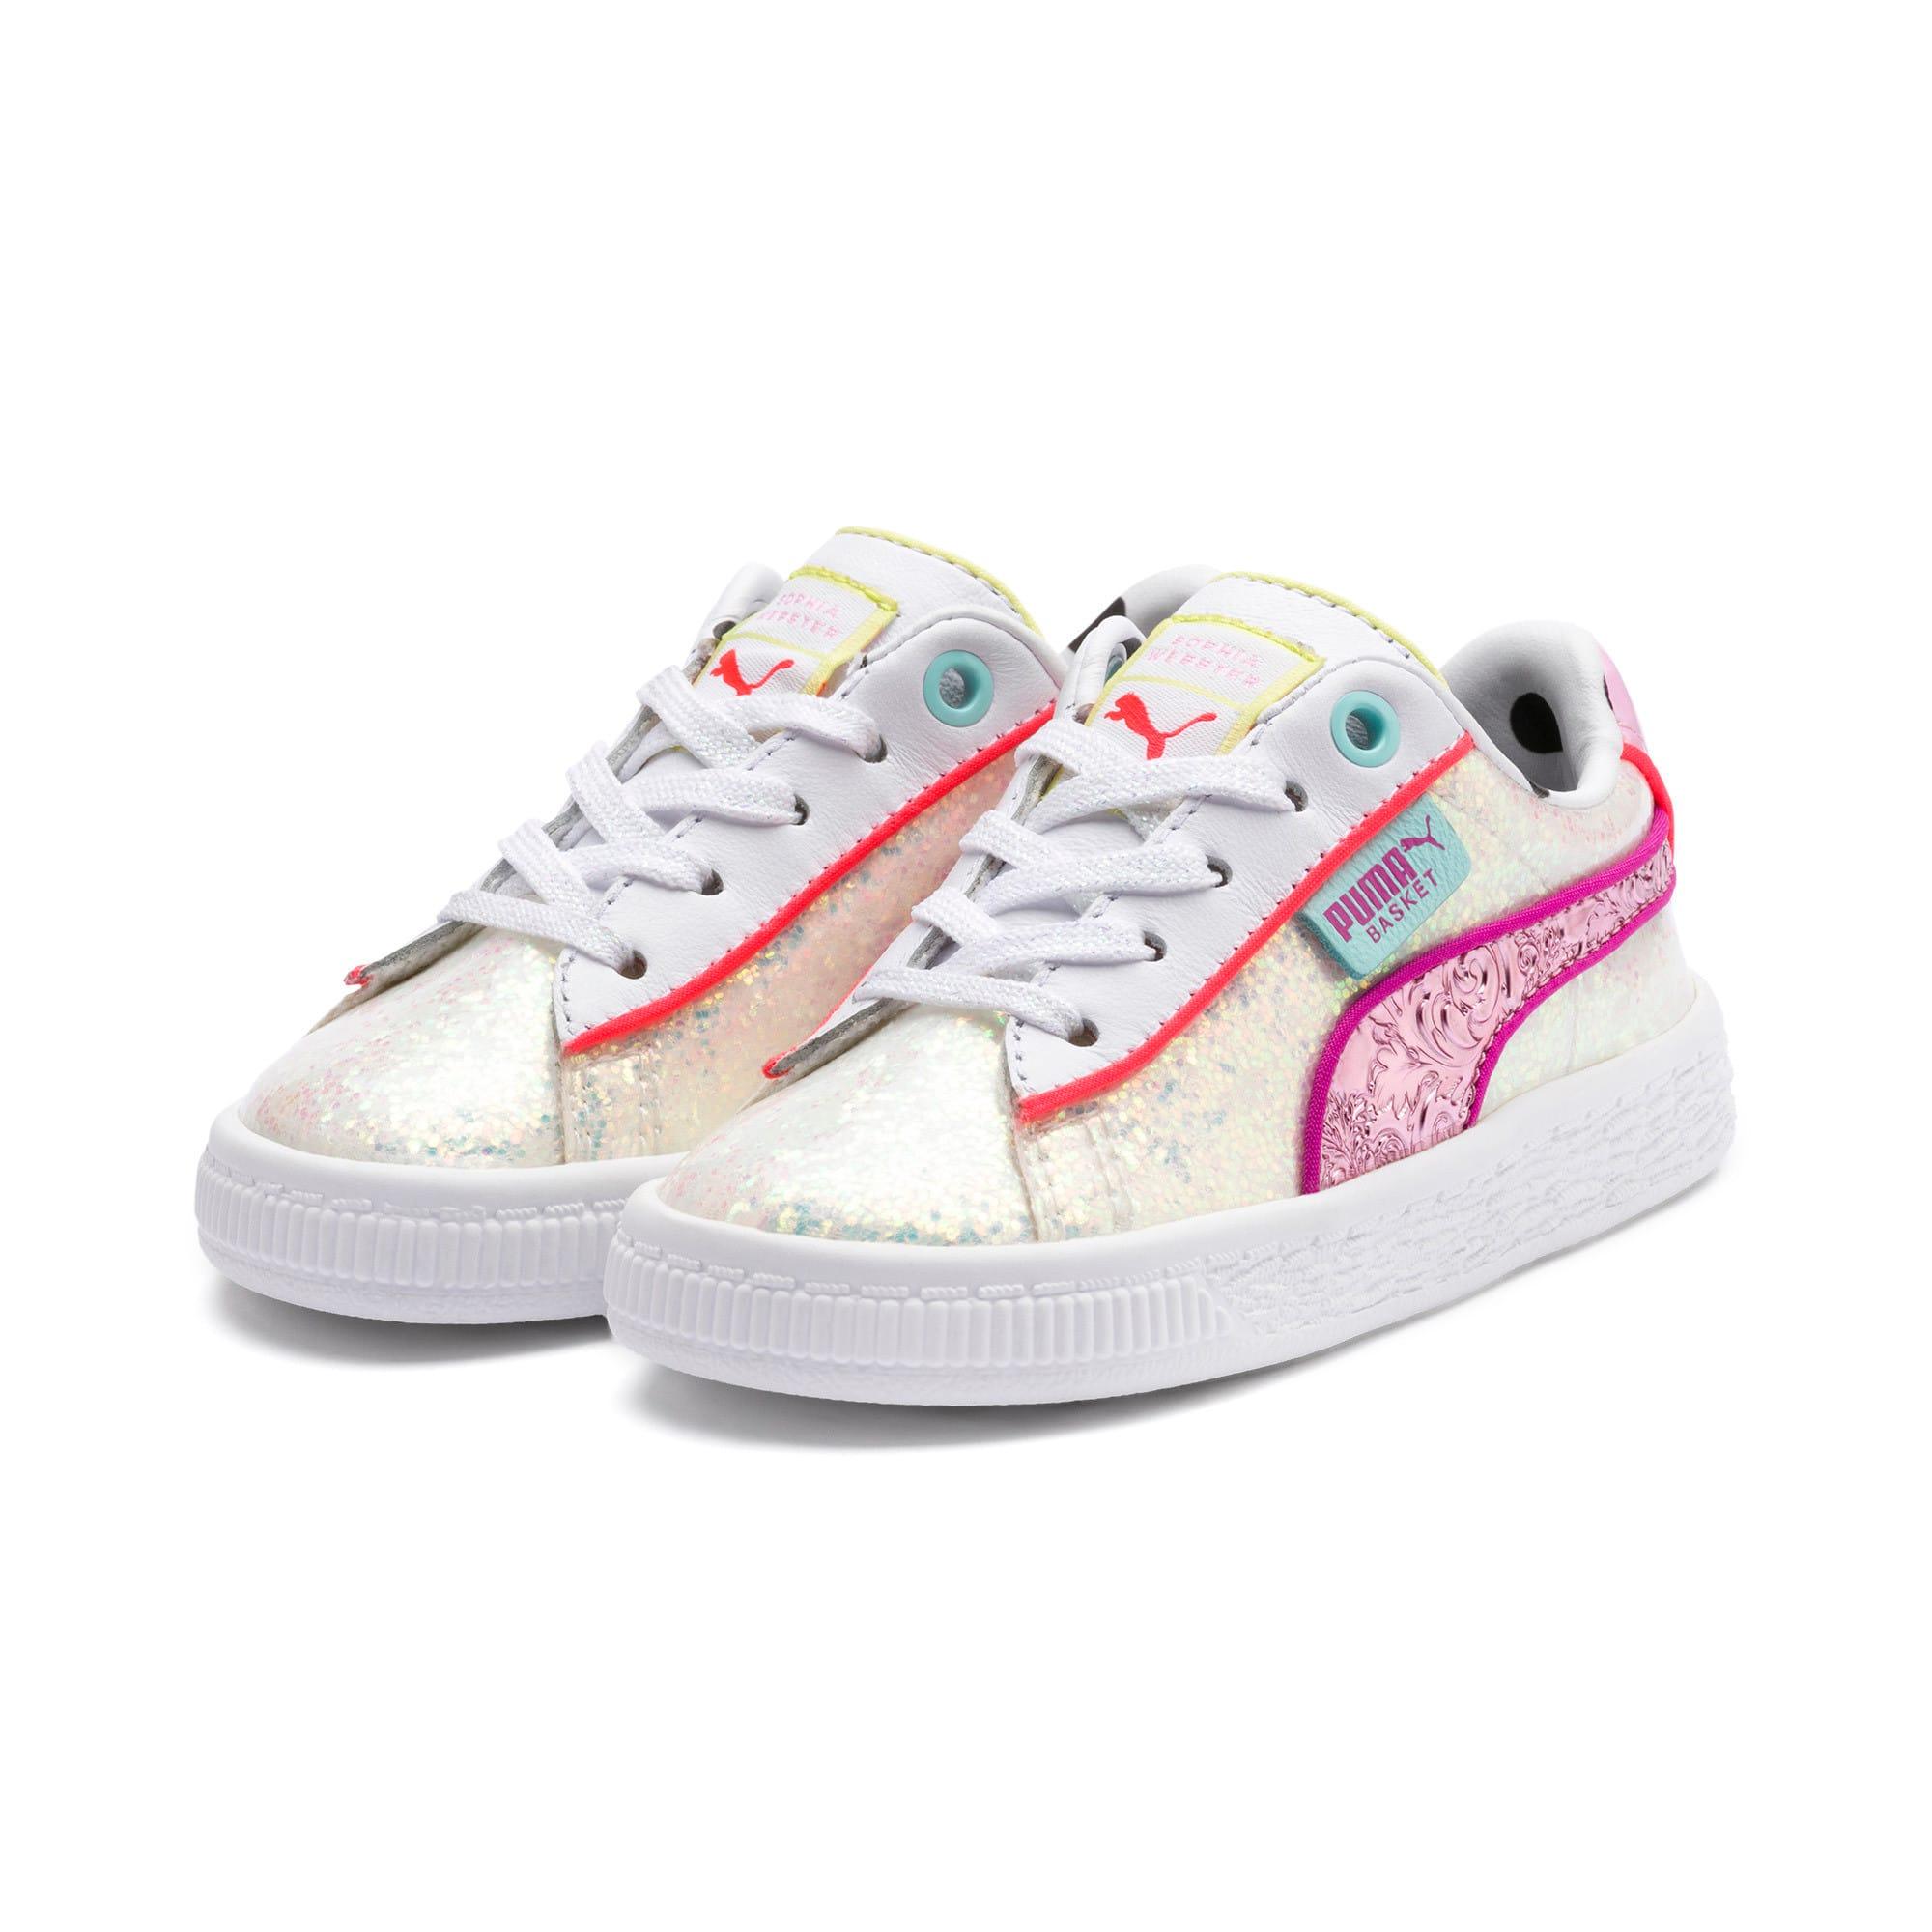 Miniatura 2 de ZapatosPUMA x SOPHIA WEBSTER Basket para bebés, Puma White-Pale Pink, mediano